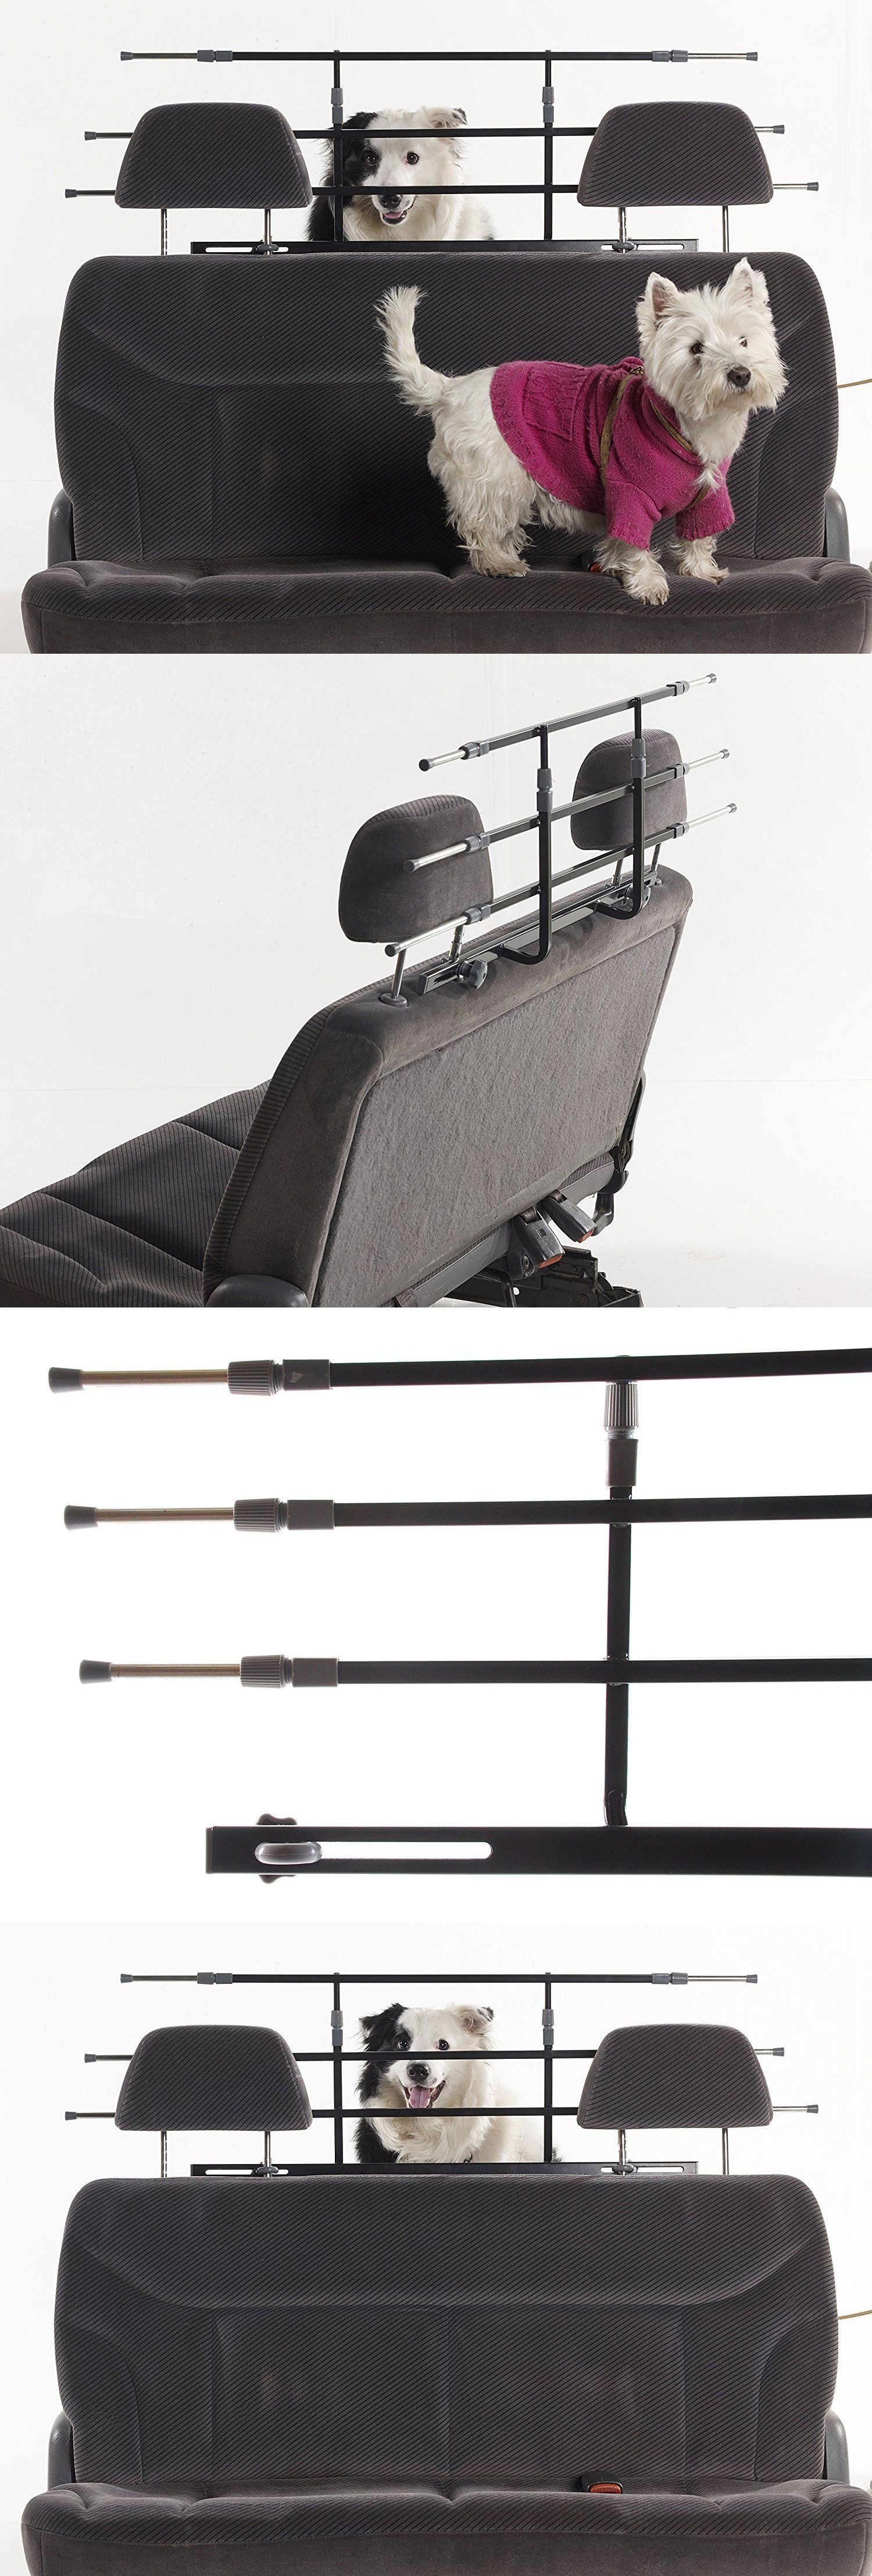 Car seats and barriers petego kar keeper car barrier for